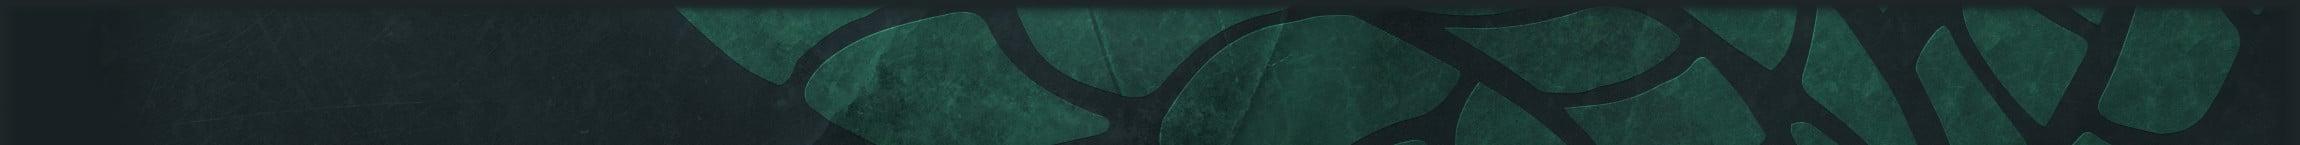 Ludomaniacal - Destiny 2 Legendary Emblem - light gg